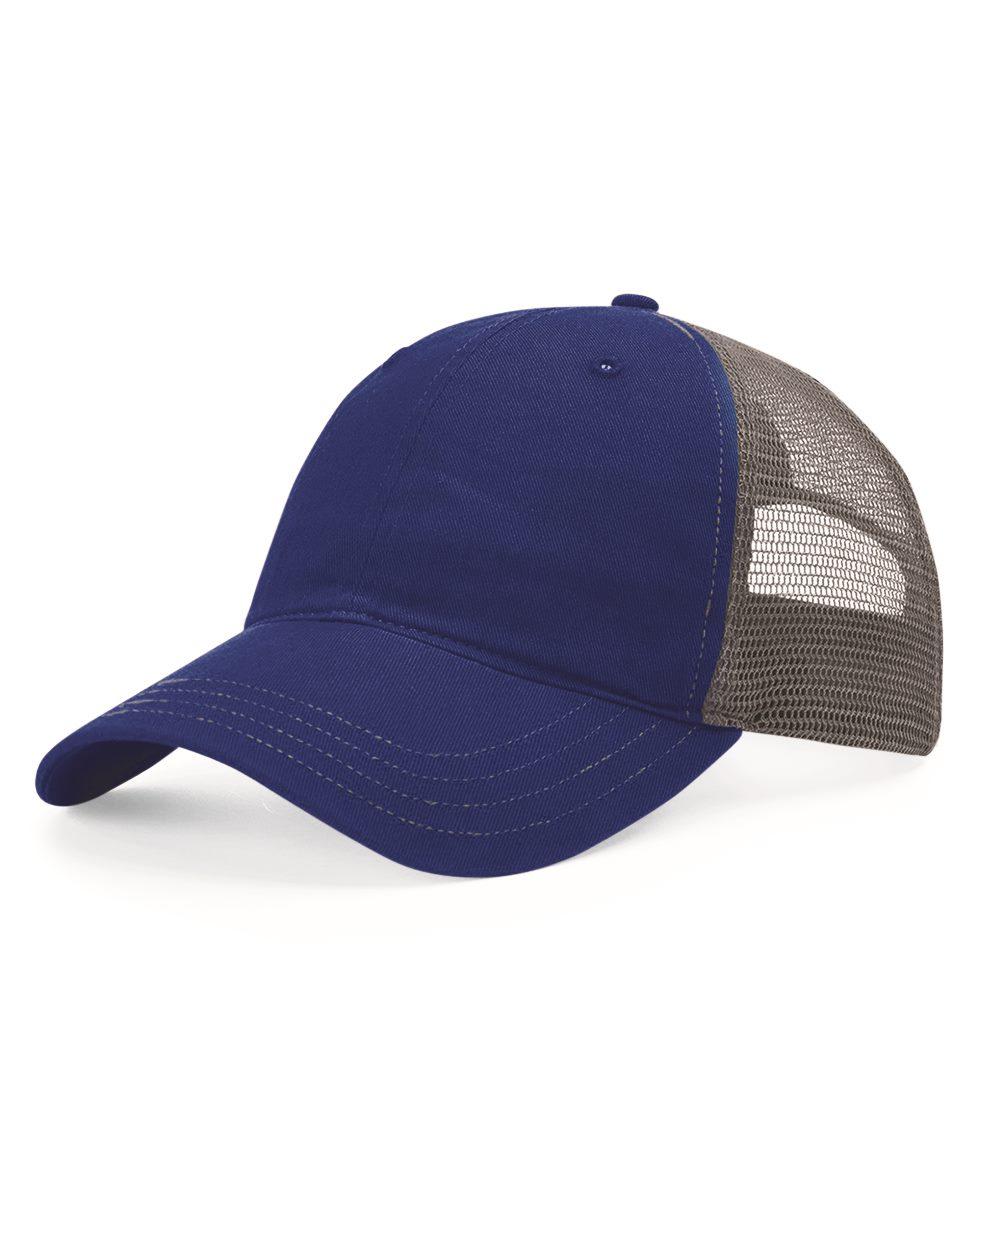 Richardson 111 - Garment Washed Trucker Cap